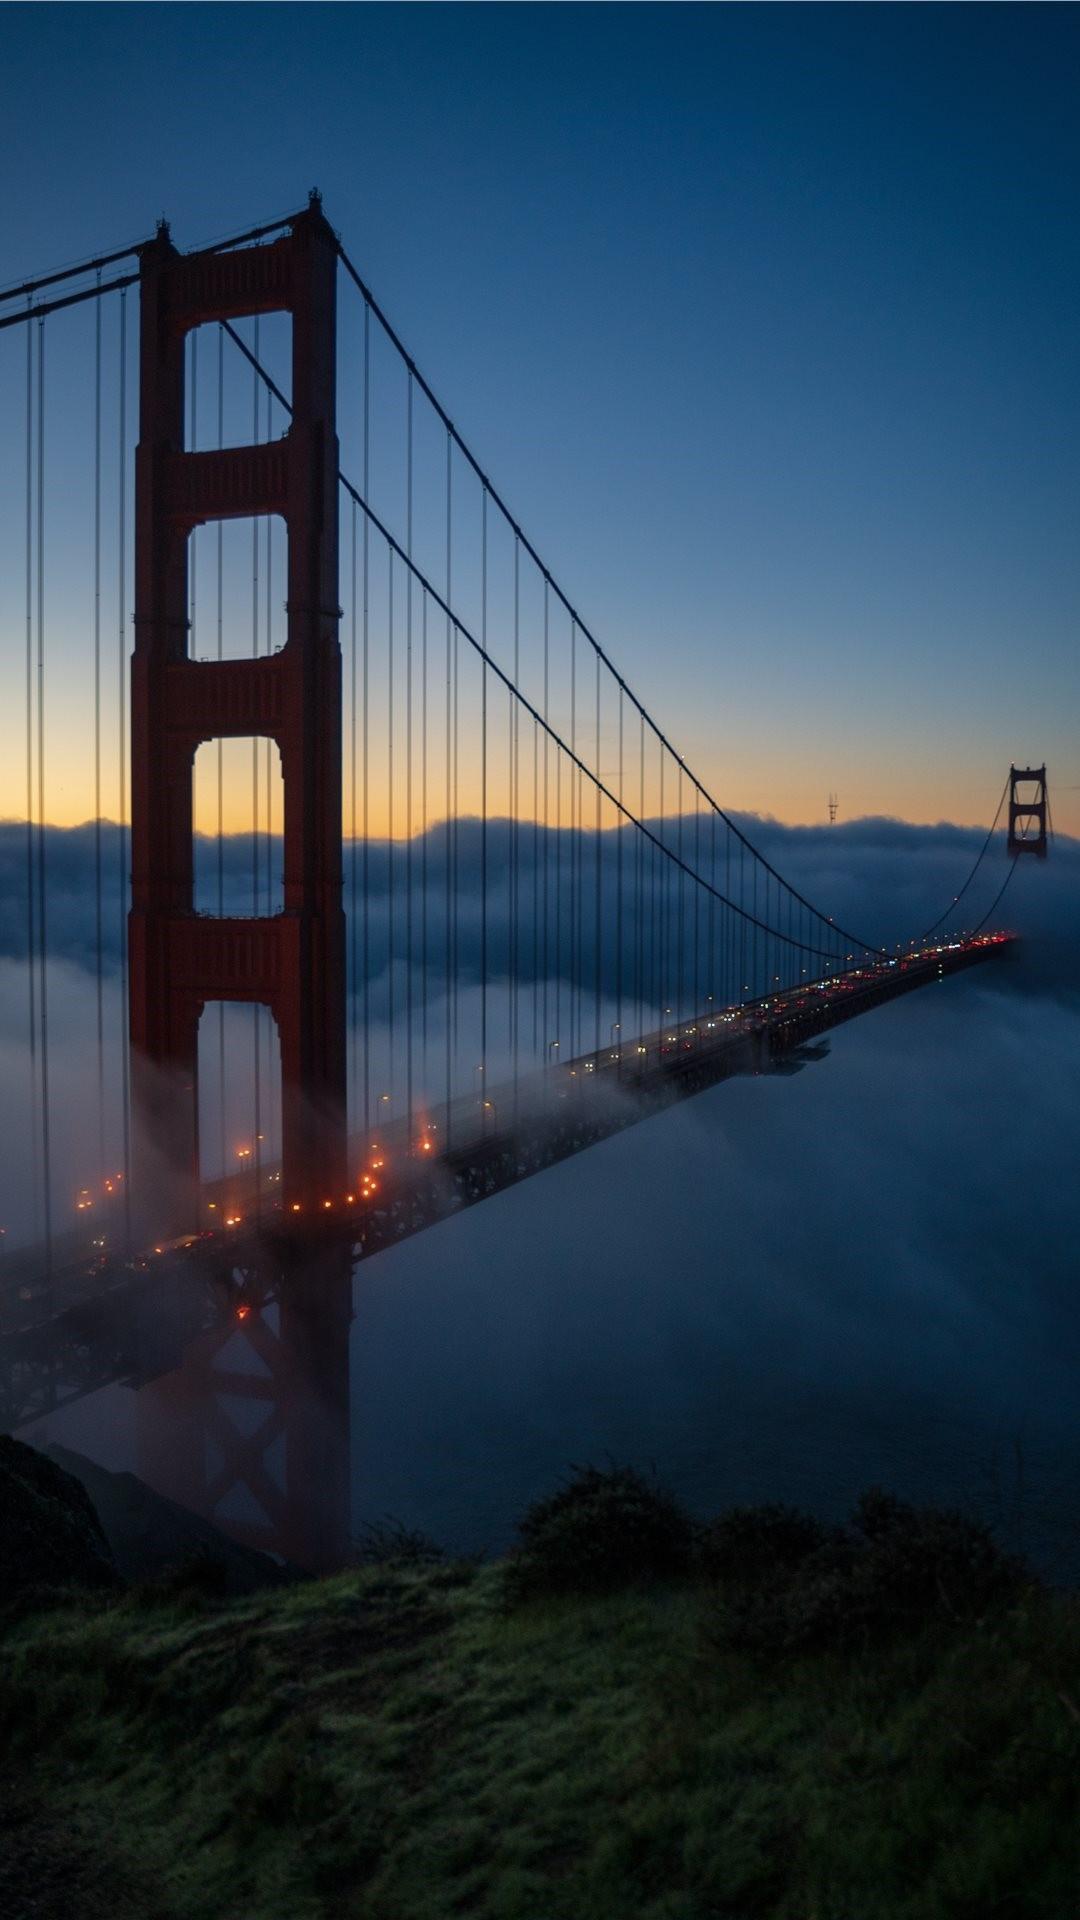 Golden Gate Bridge iphone 6s plus wallpaper